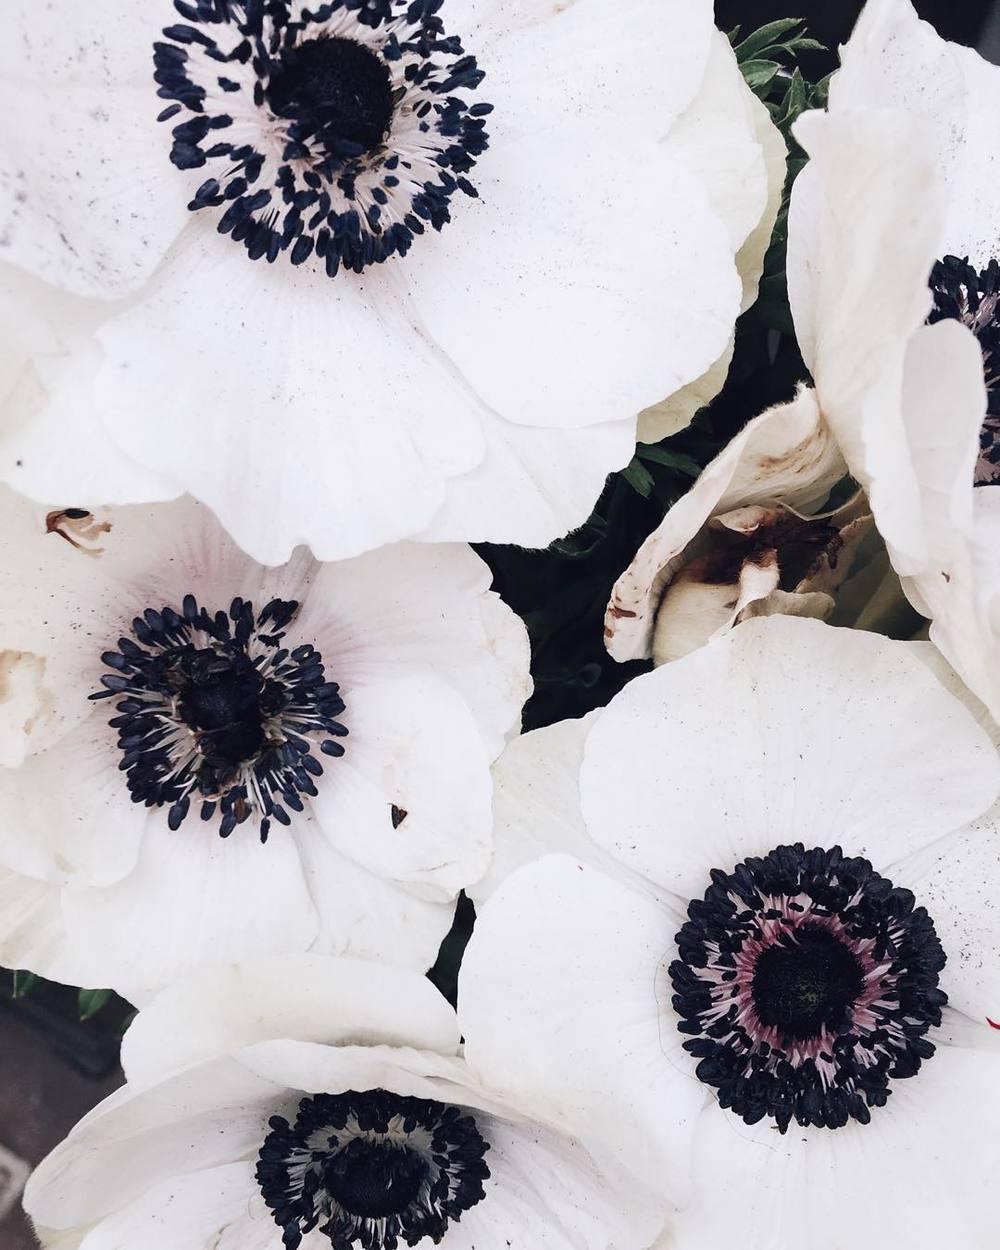 Liberty_flowers__.__libertylondon_by_mija_mija.jpg